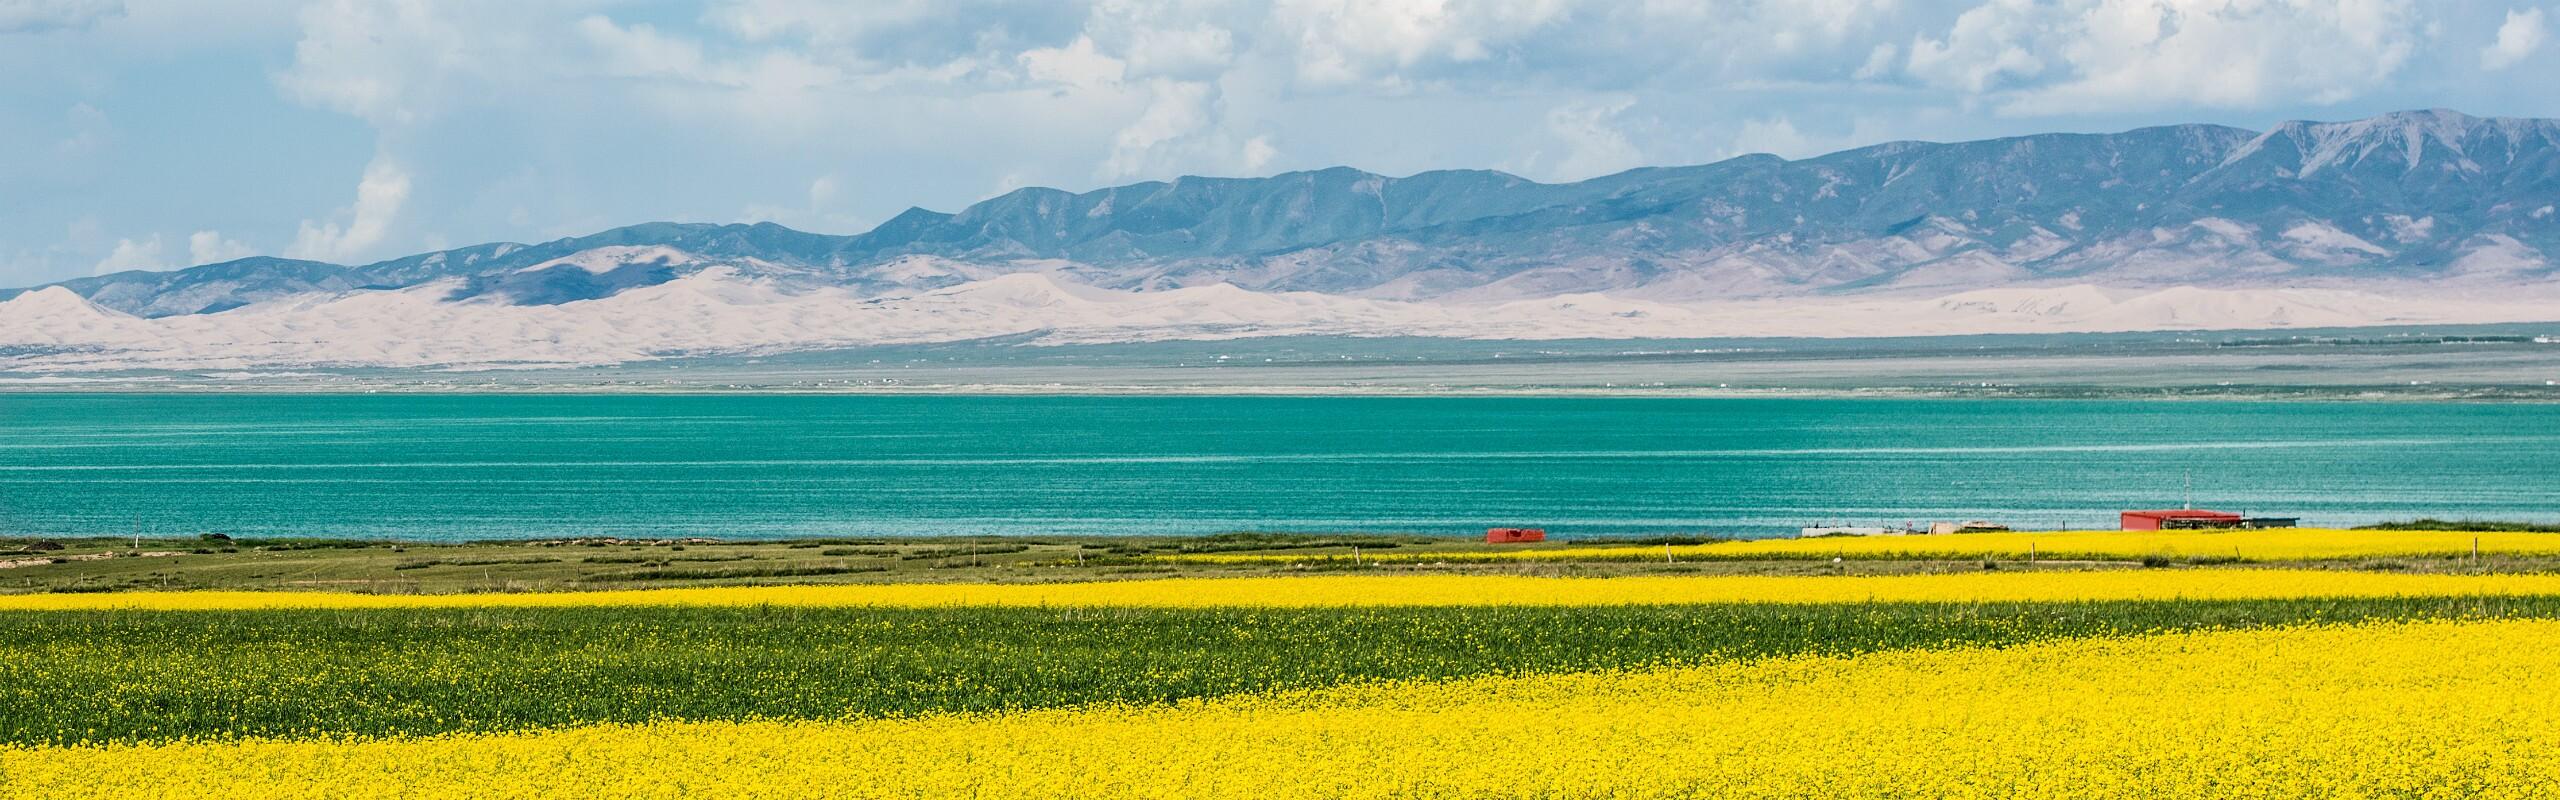 8 Days Qinghai Lake, Zhangye, and Dunhuang Tour